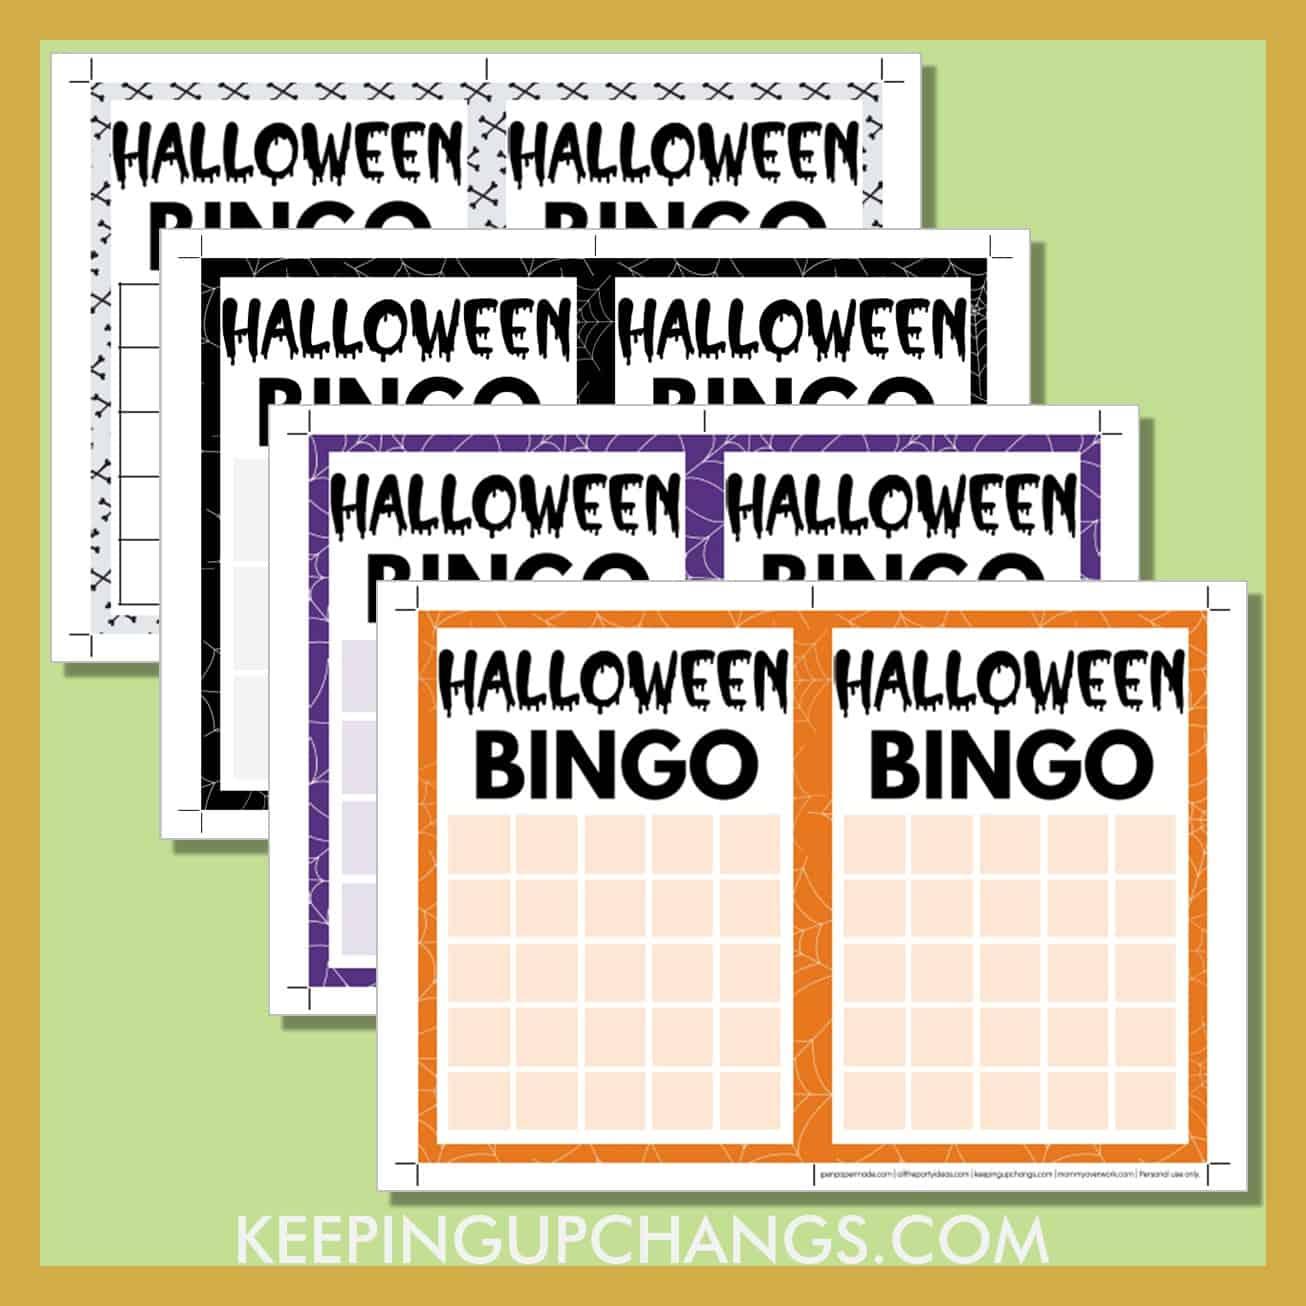 free blank halloween bingo card printable templates in 3x3, 4x4 and 5x5 grids.